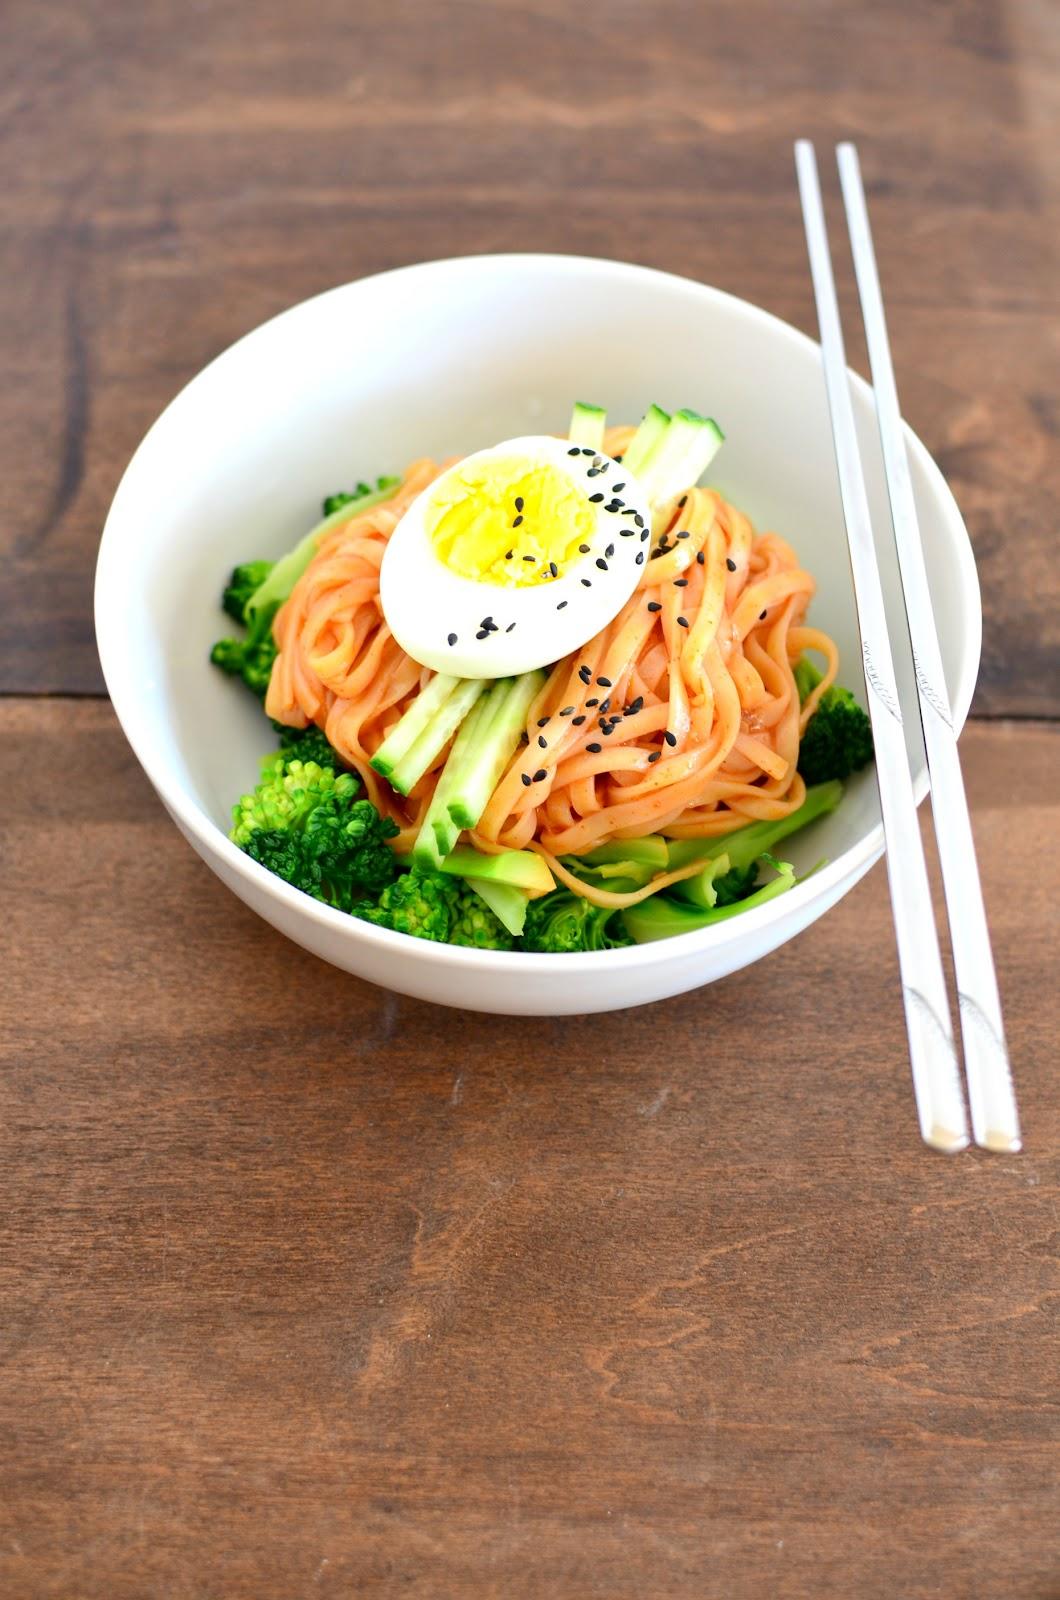 Apricosa: Bibimguksu (비빔국수) Korean Spicy Cold Noodles